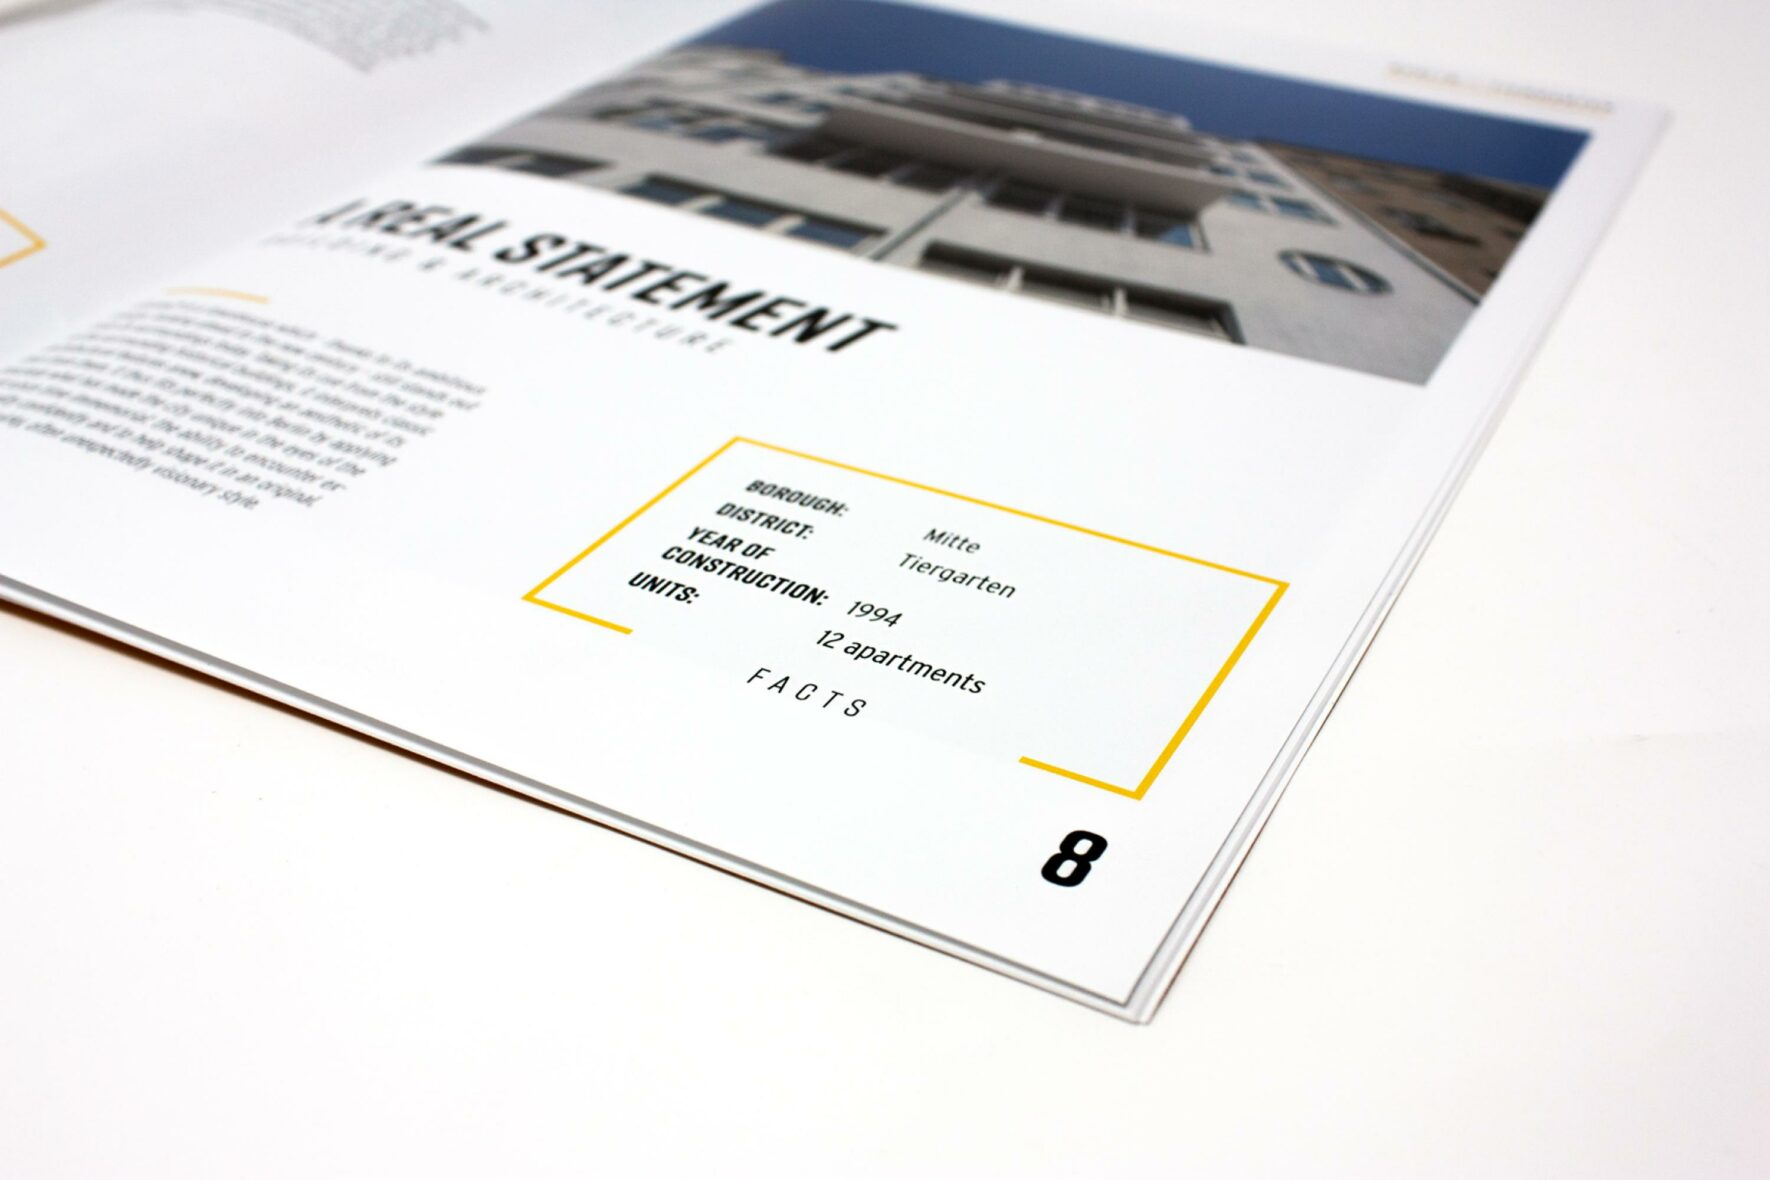 Immobilienbranding-Luetzow-Trendcity-Broschüre-FORMLOS-berlin-Print_MG_8353